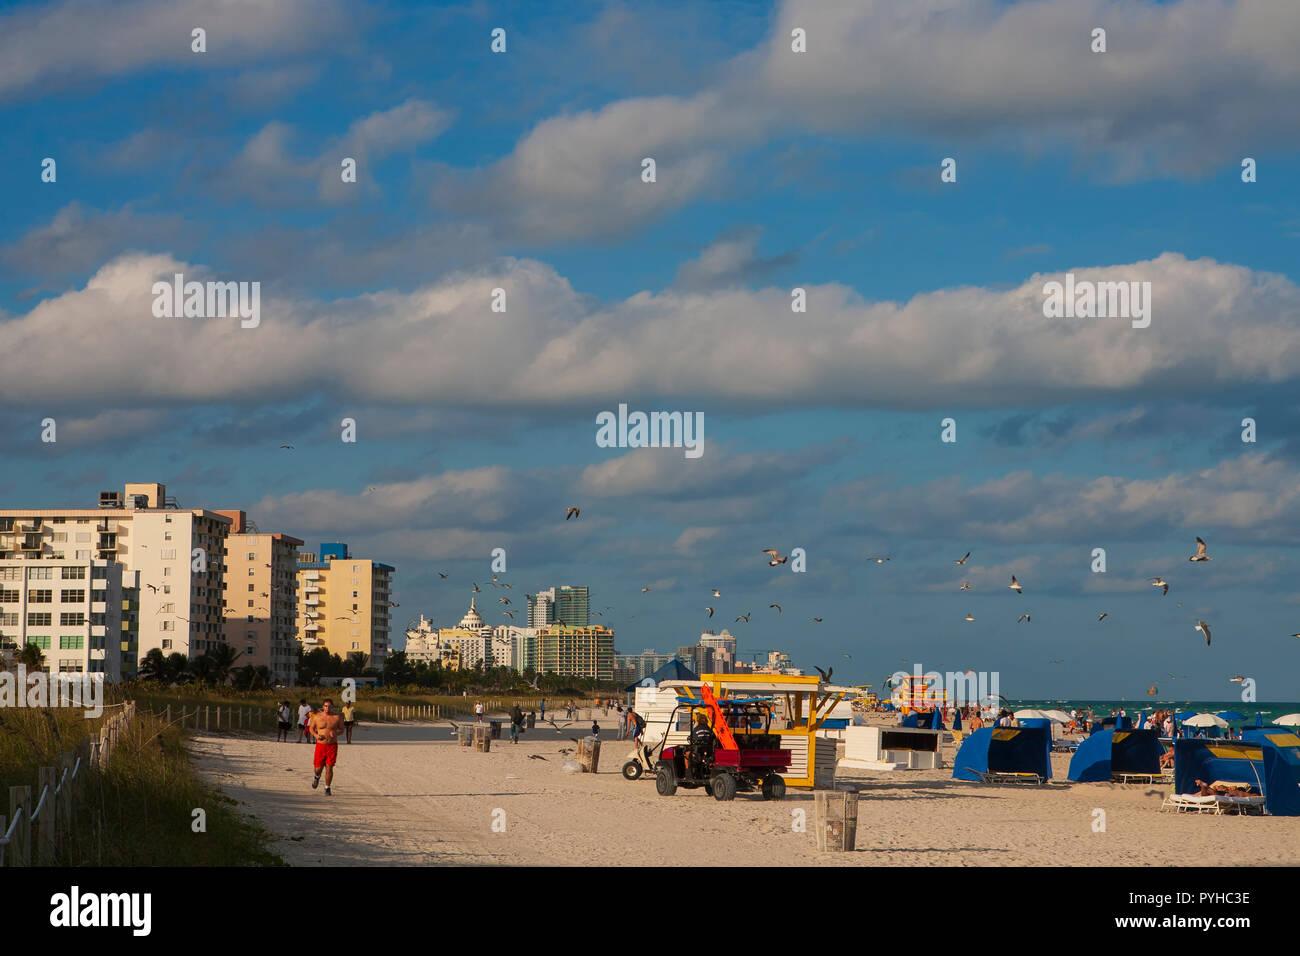 Man jogging on the beach, Miami Beach, Florida. - Stock Image